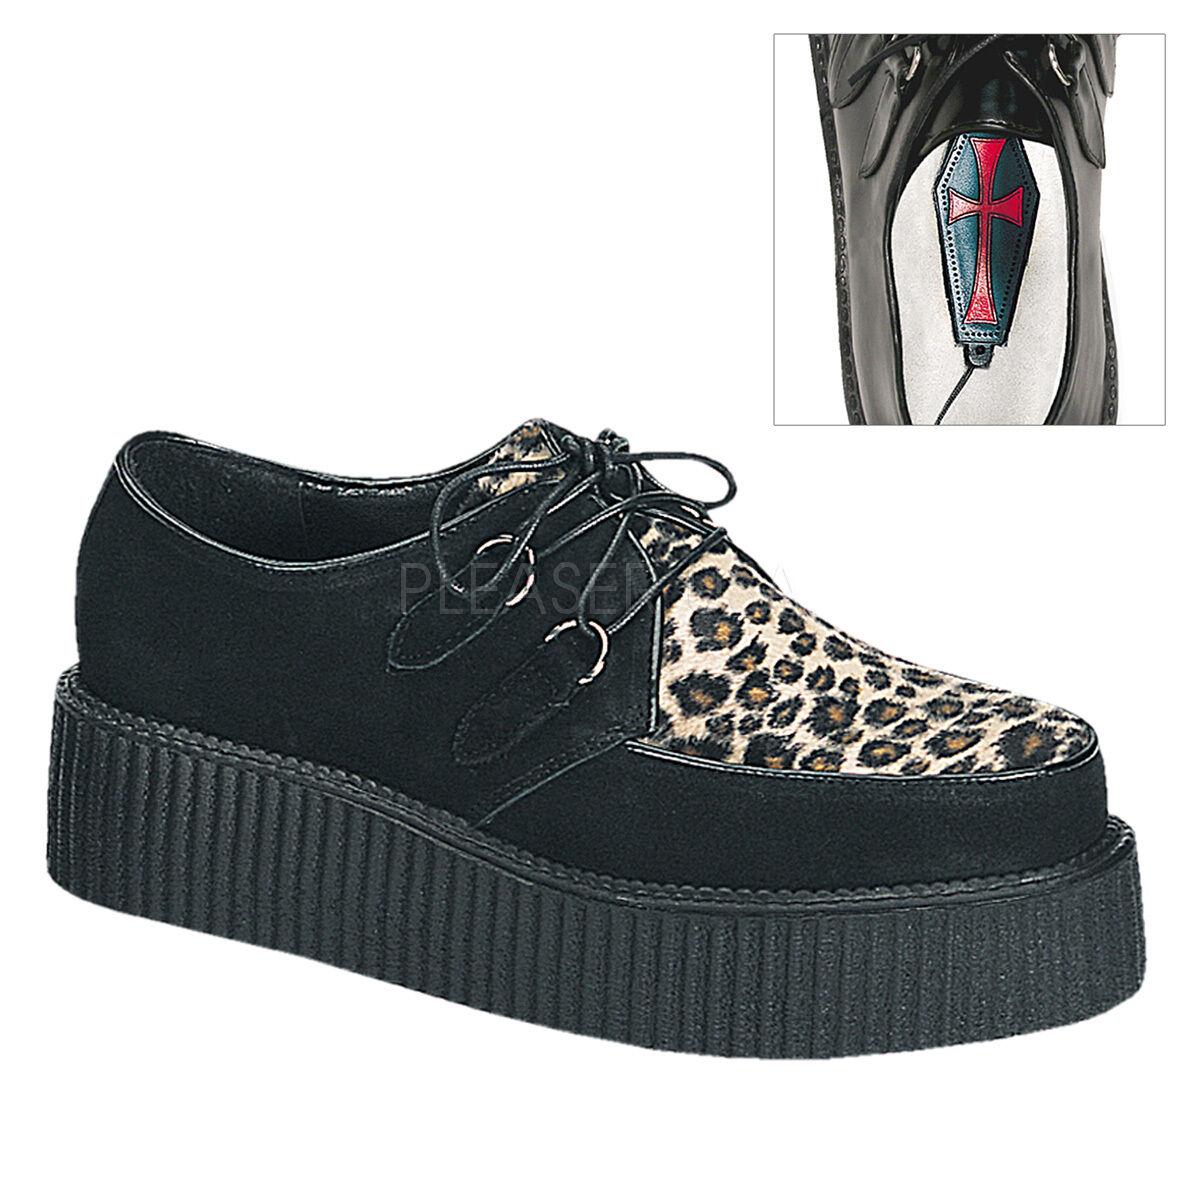 BIG SALE DEMONIA CRE400 BS FUR Women's Leopard Punk Gothic Casual Creeper shoes